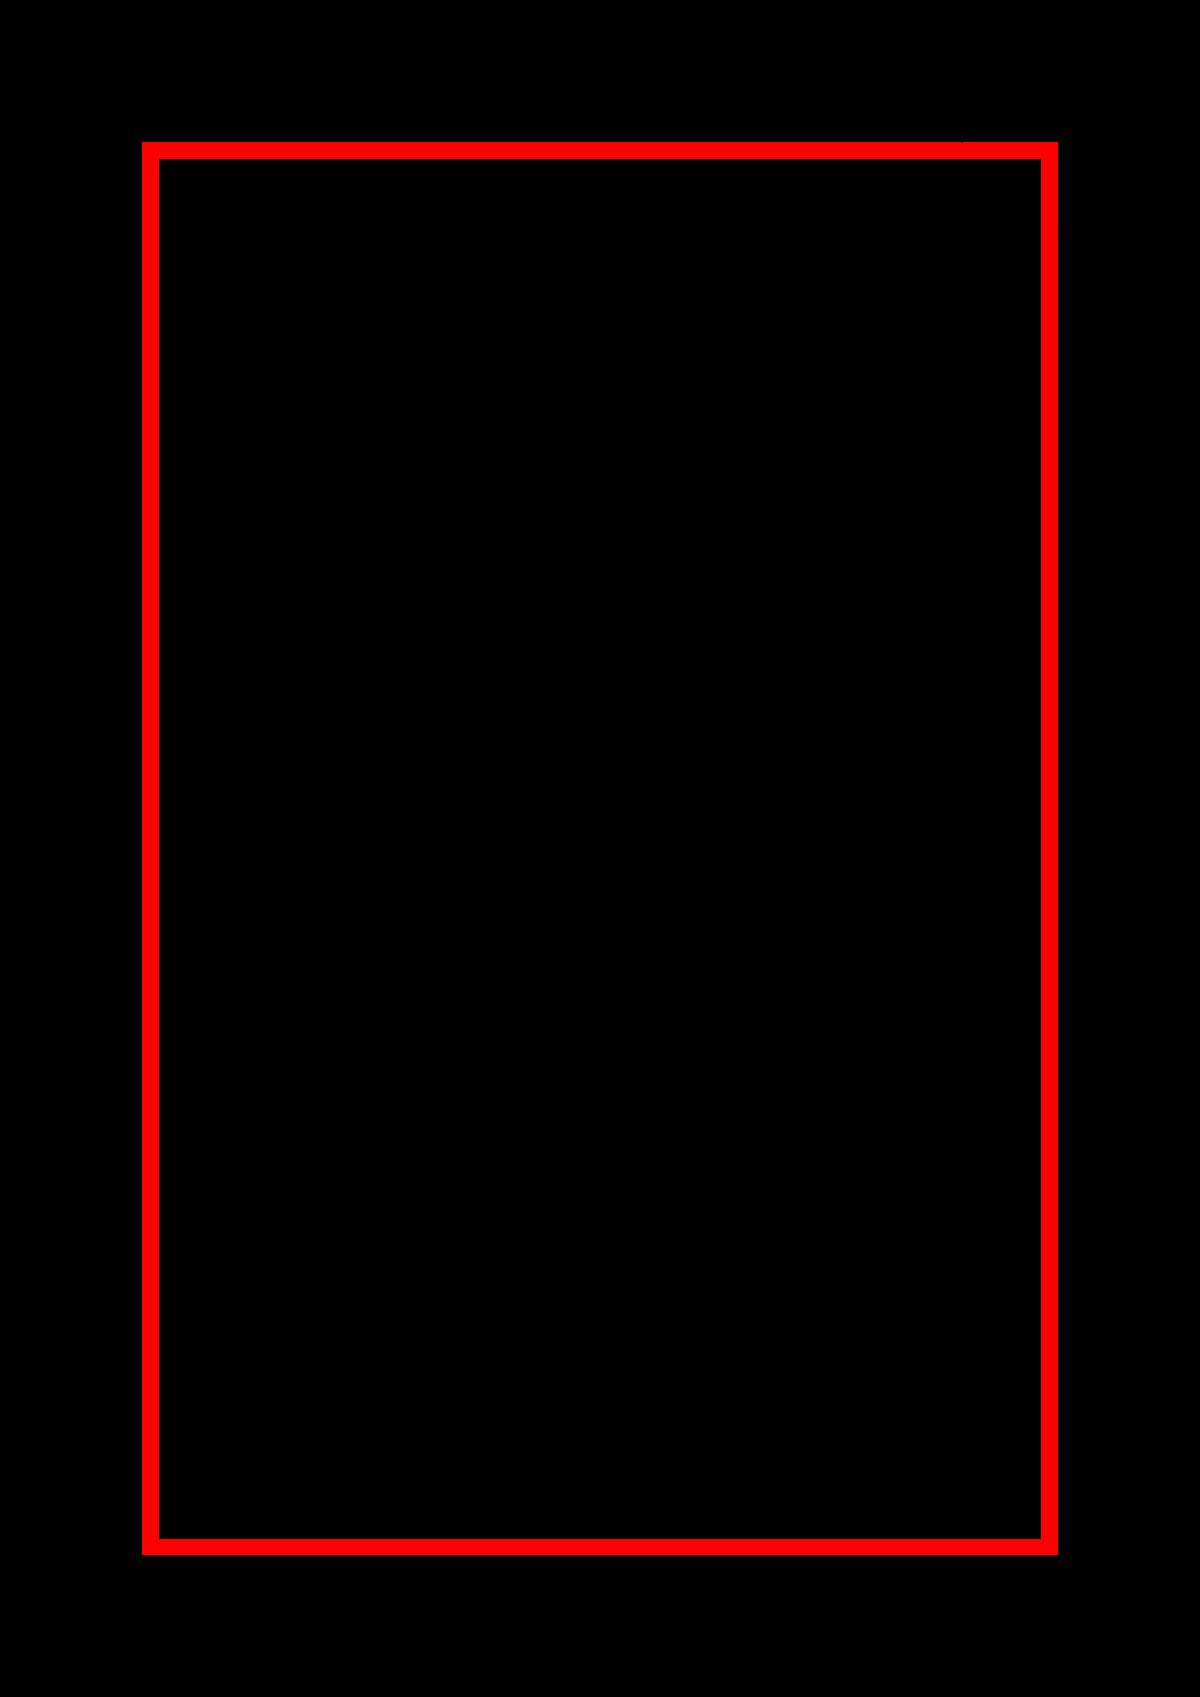 Egyptian clipart border. Margin typography wikipedia